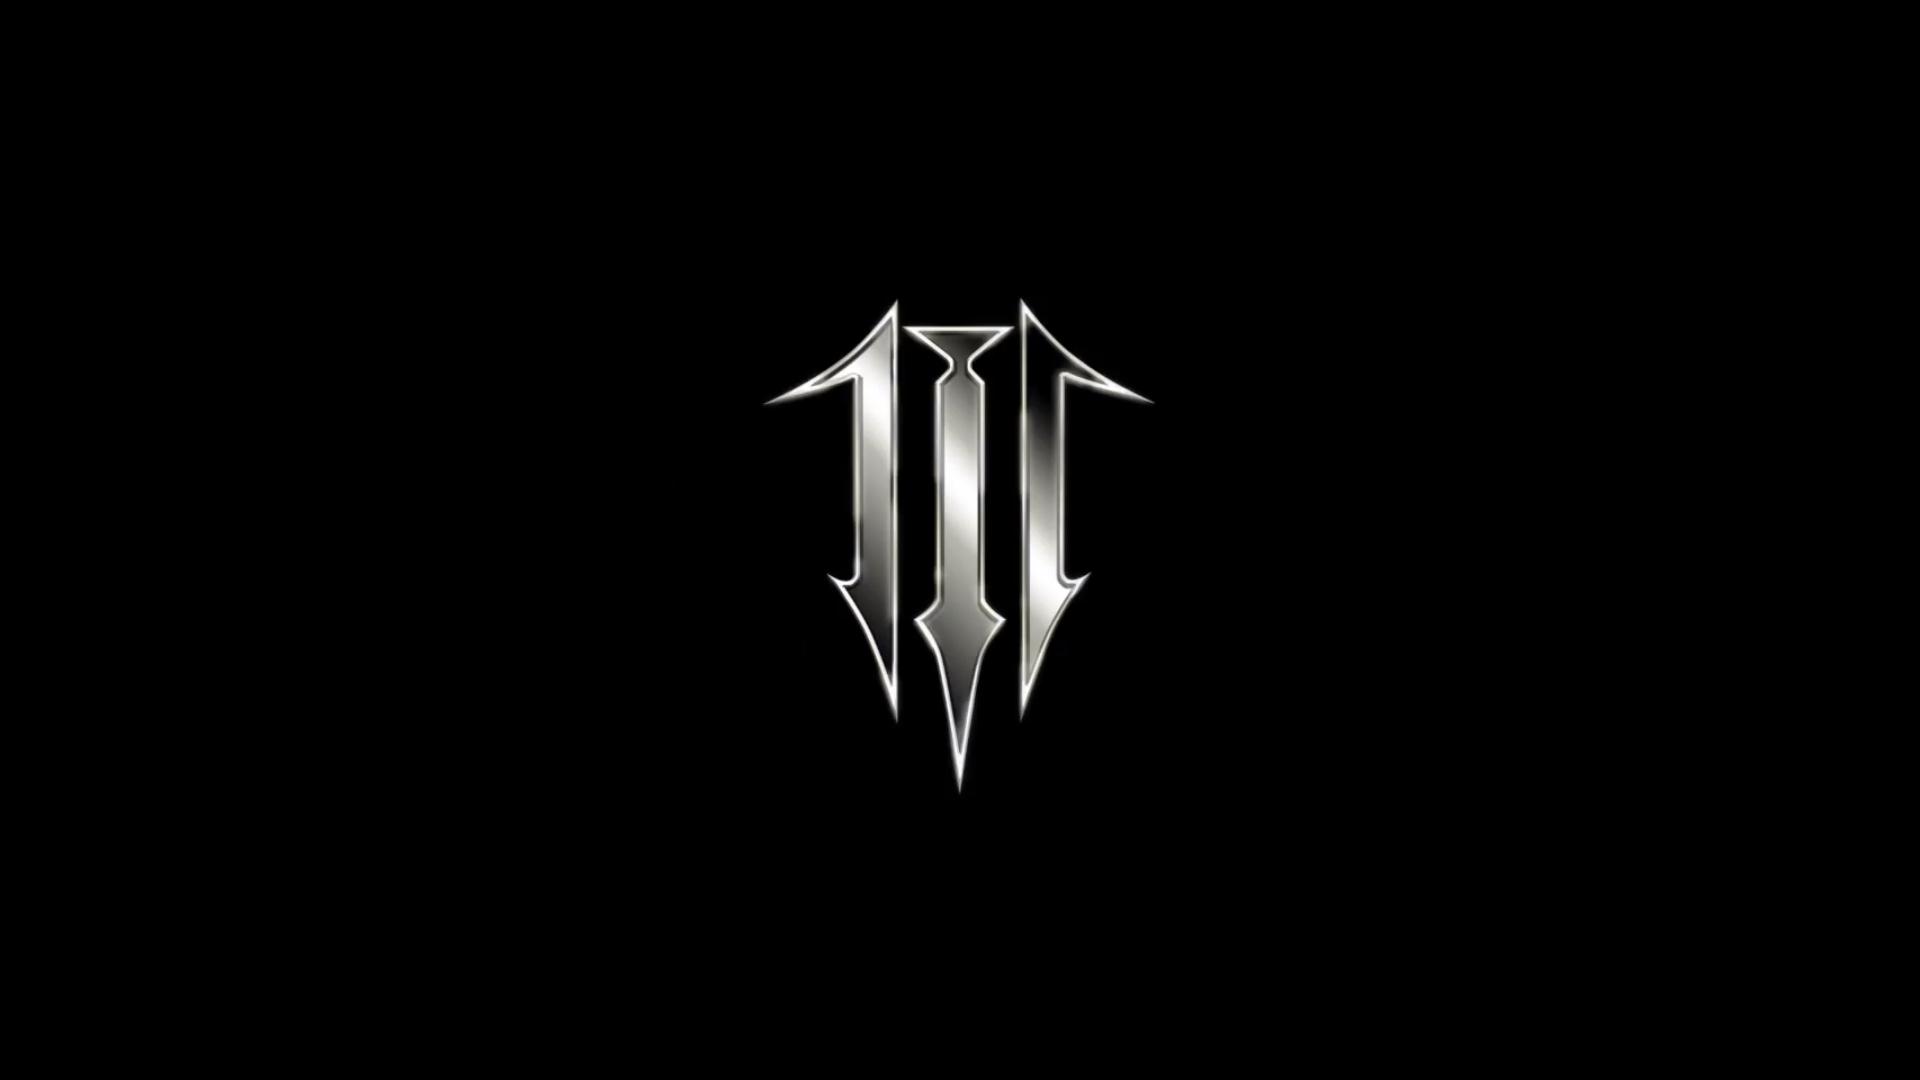 kh3 logo wallpaper : kingdomhearts